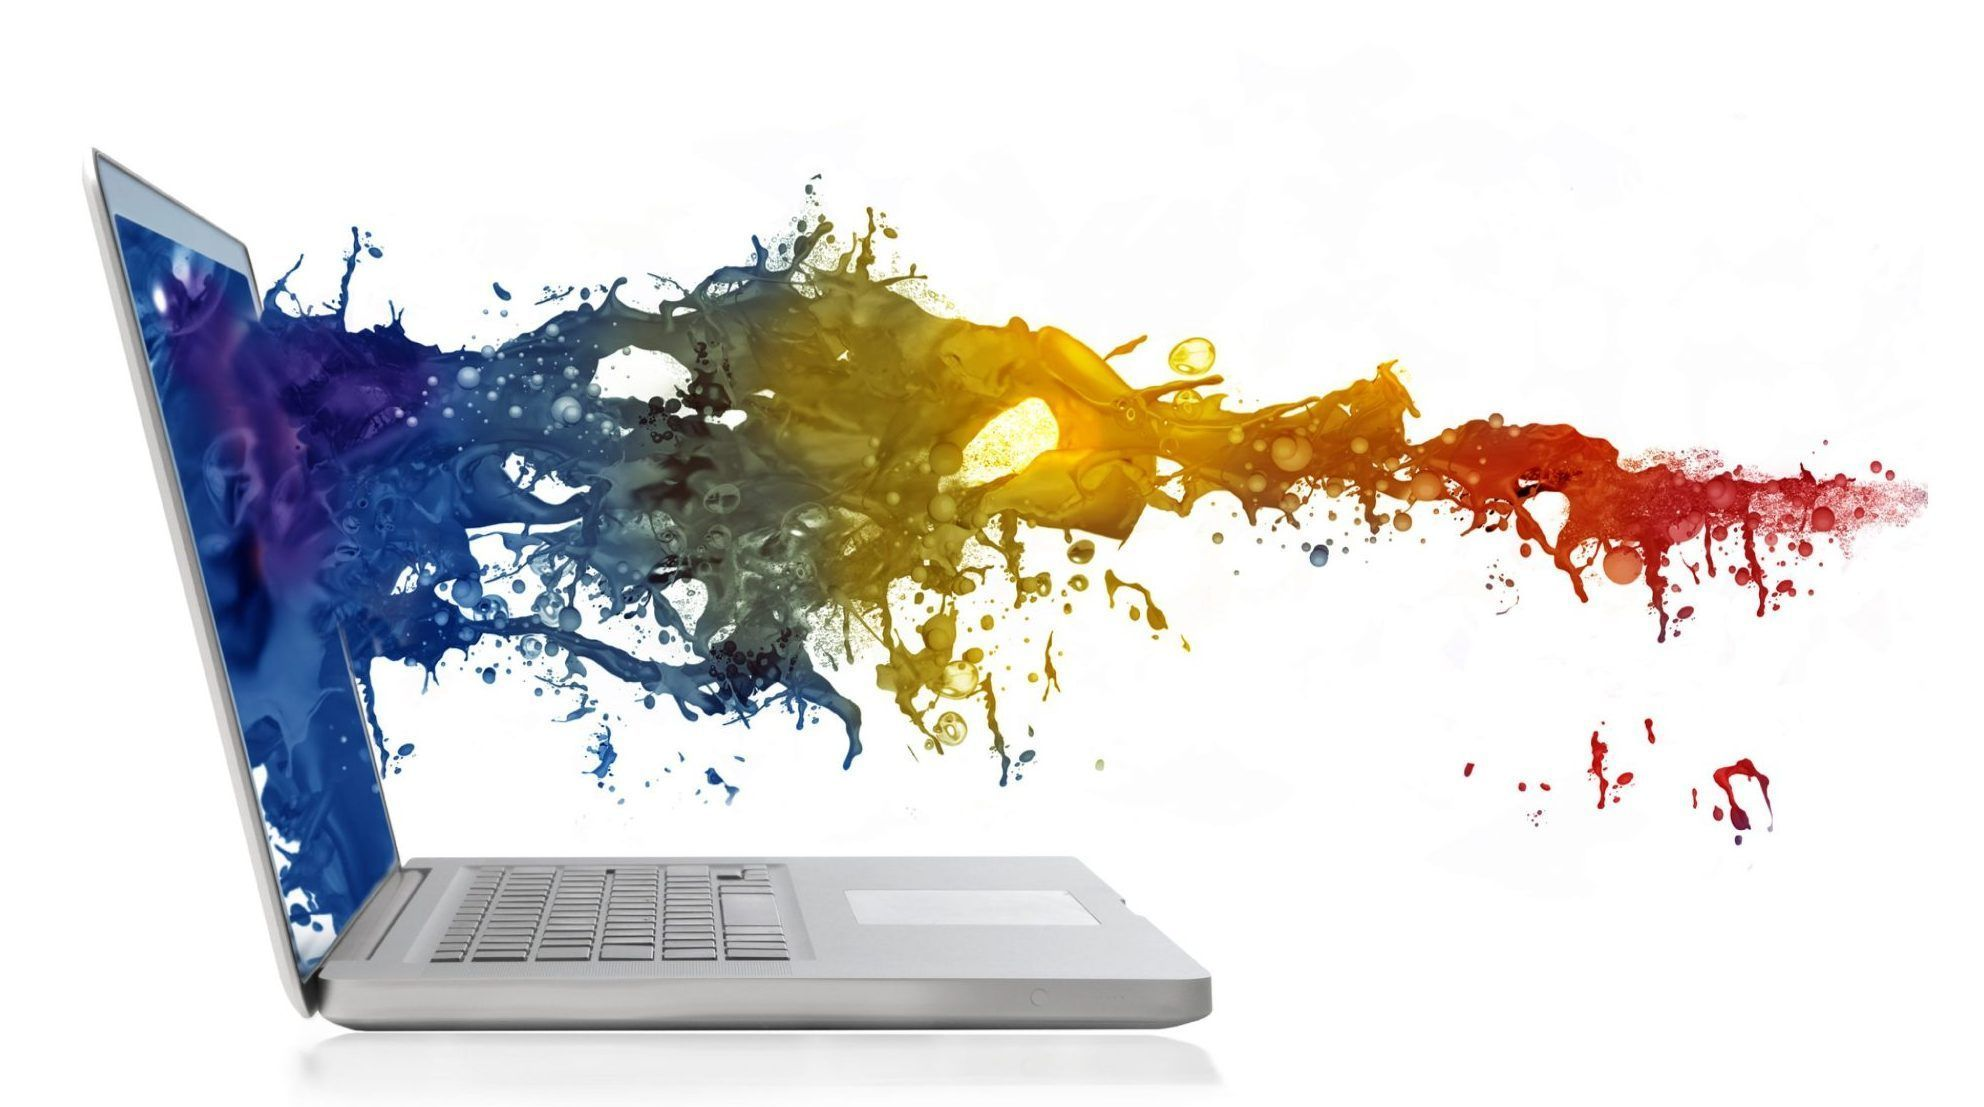 graphic design and web design services Salisbury, MD